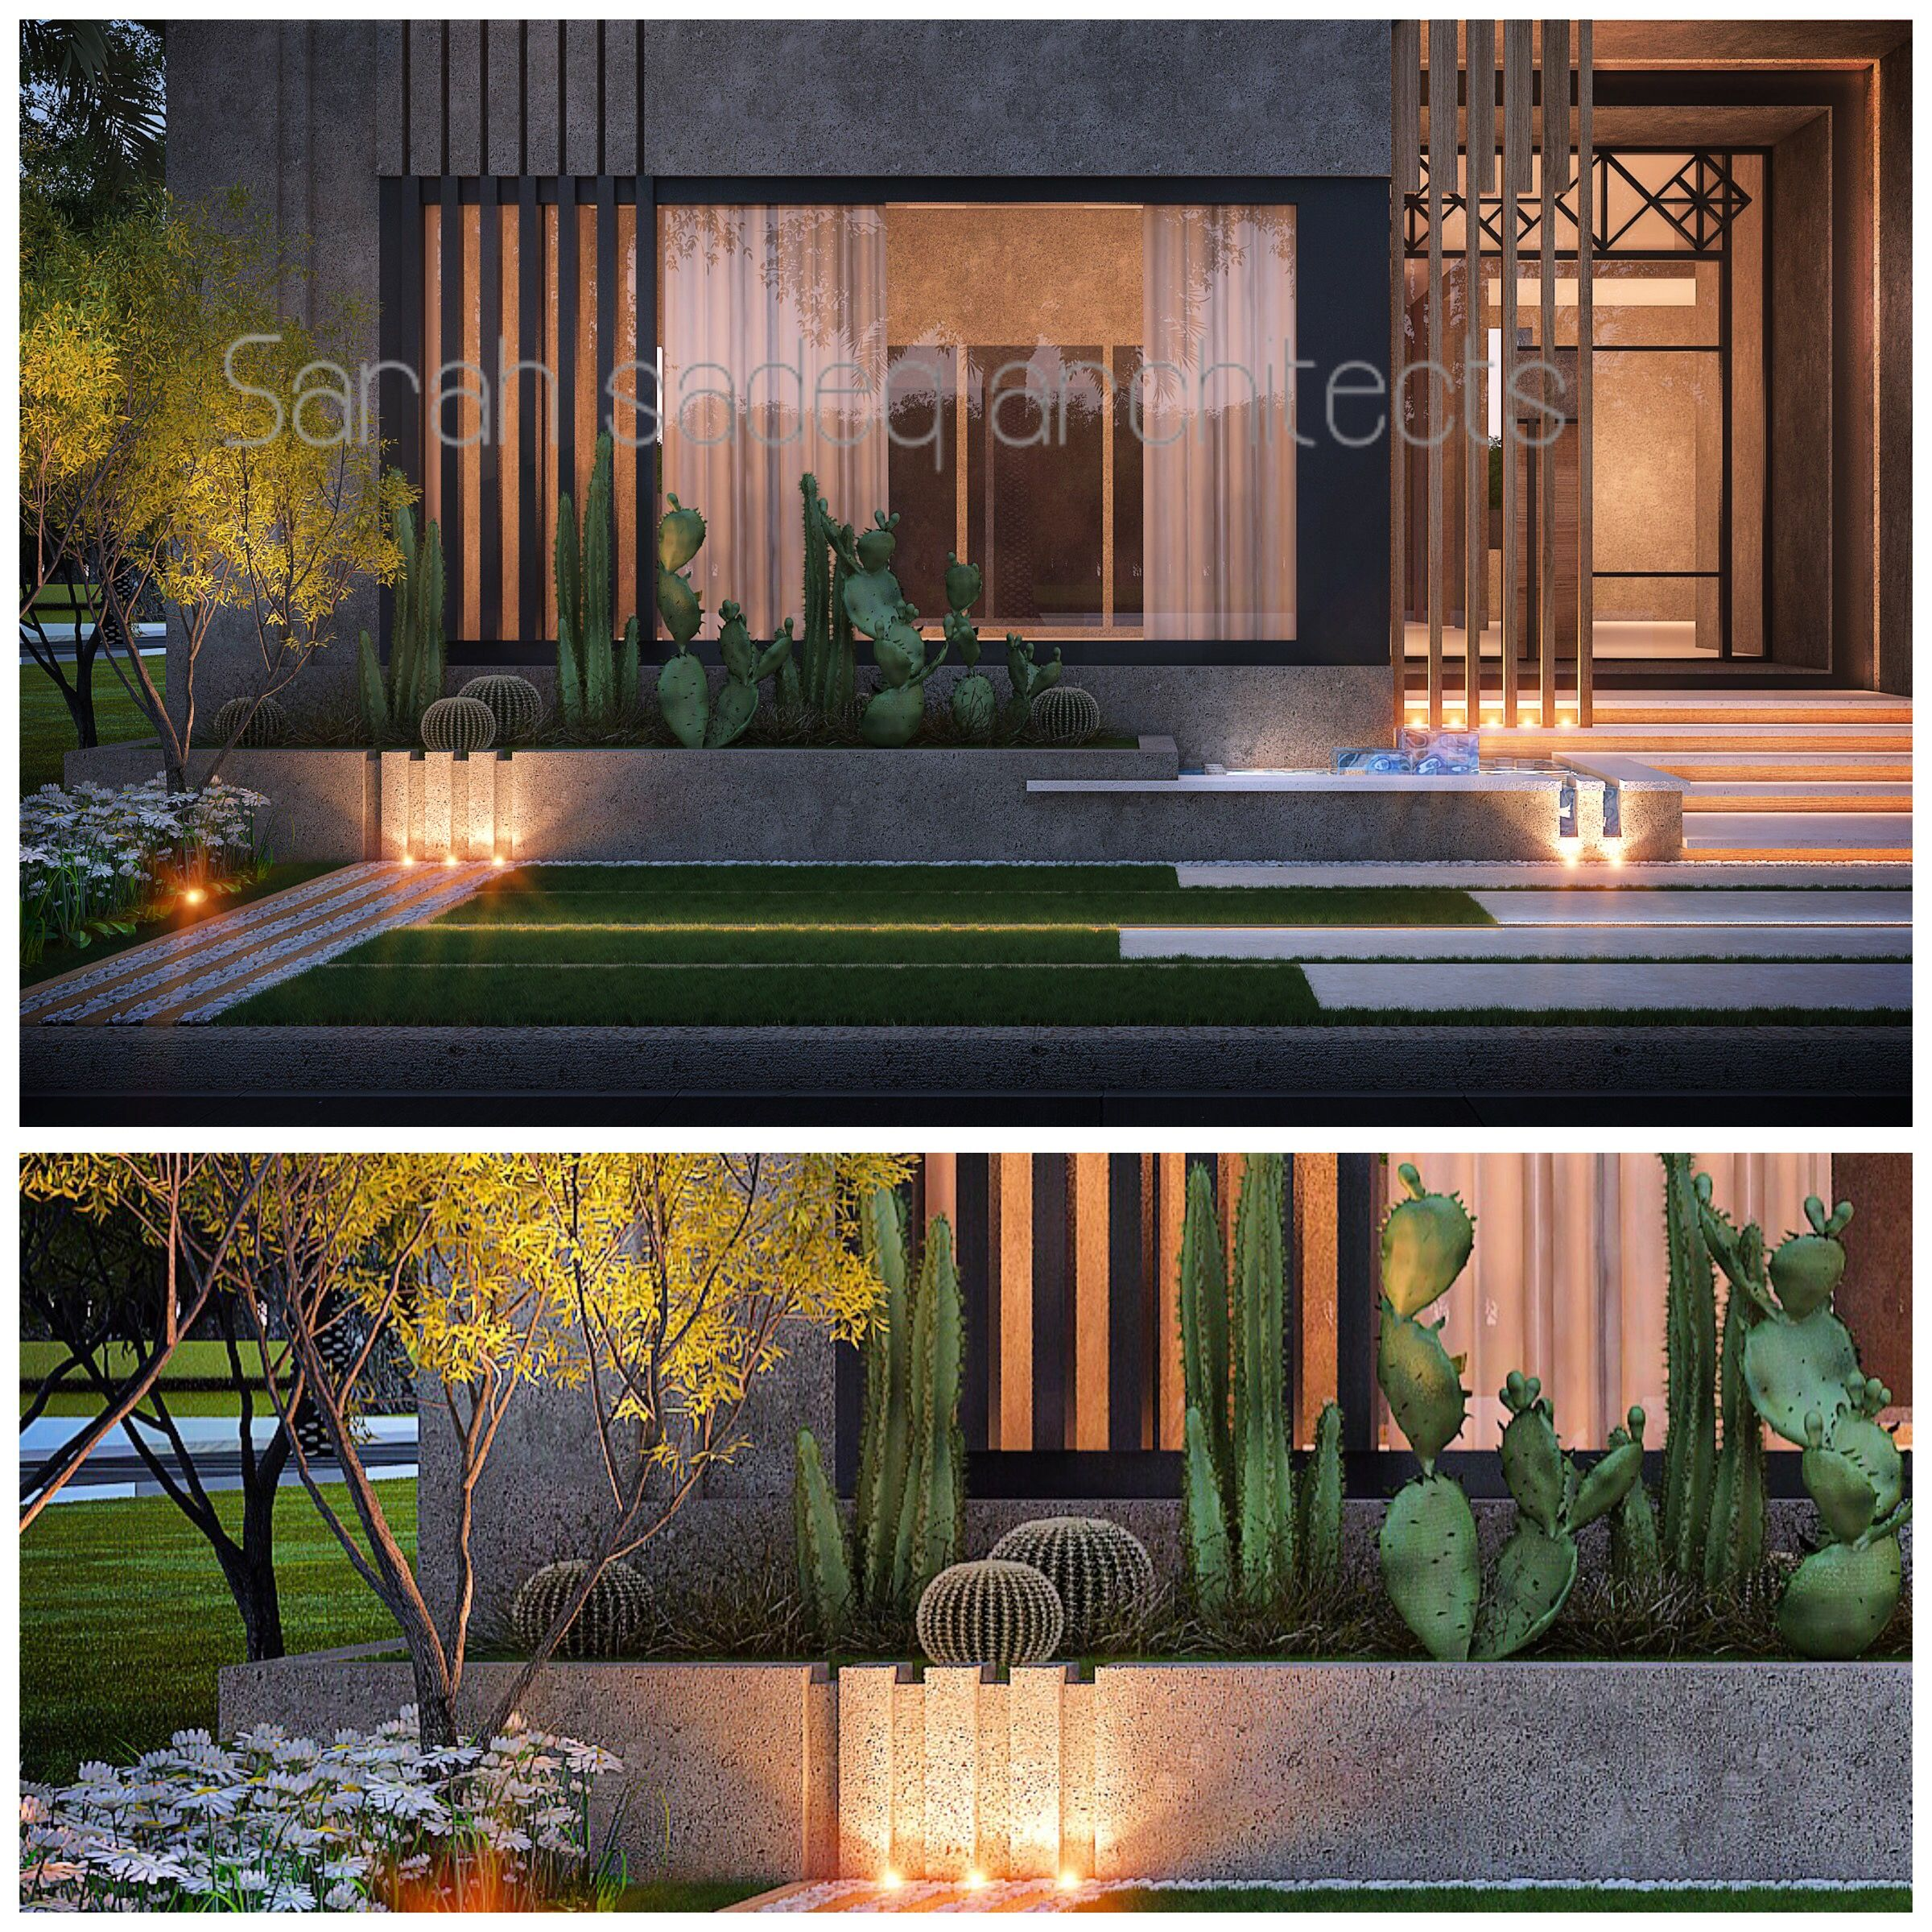 400 m private villa kuwait landscaping sarah sadeq for Garden design kuwait